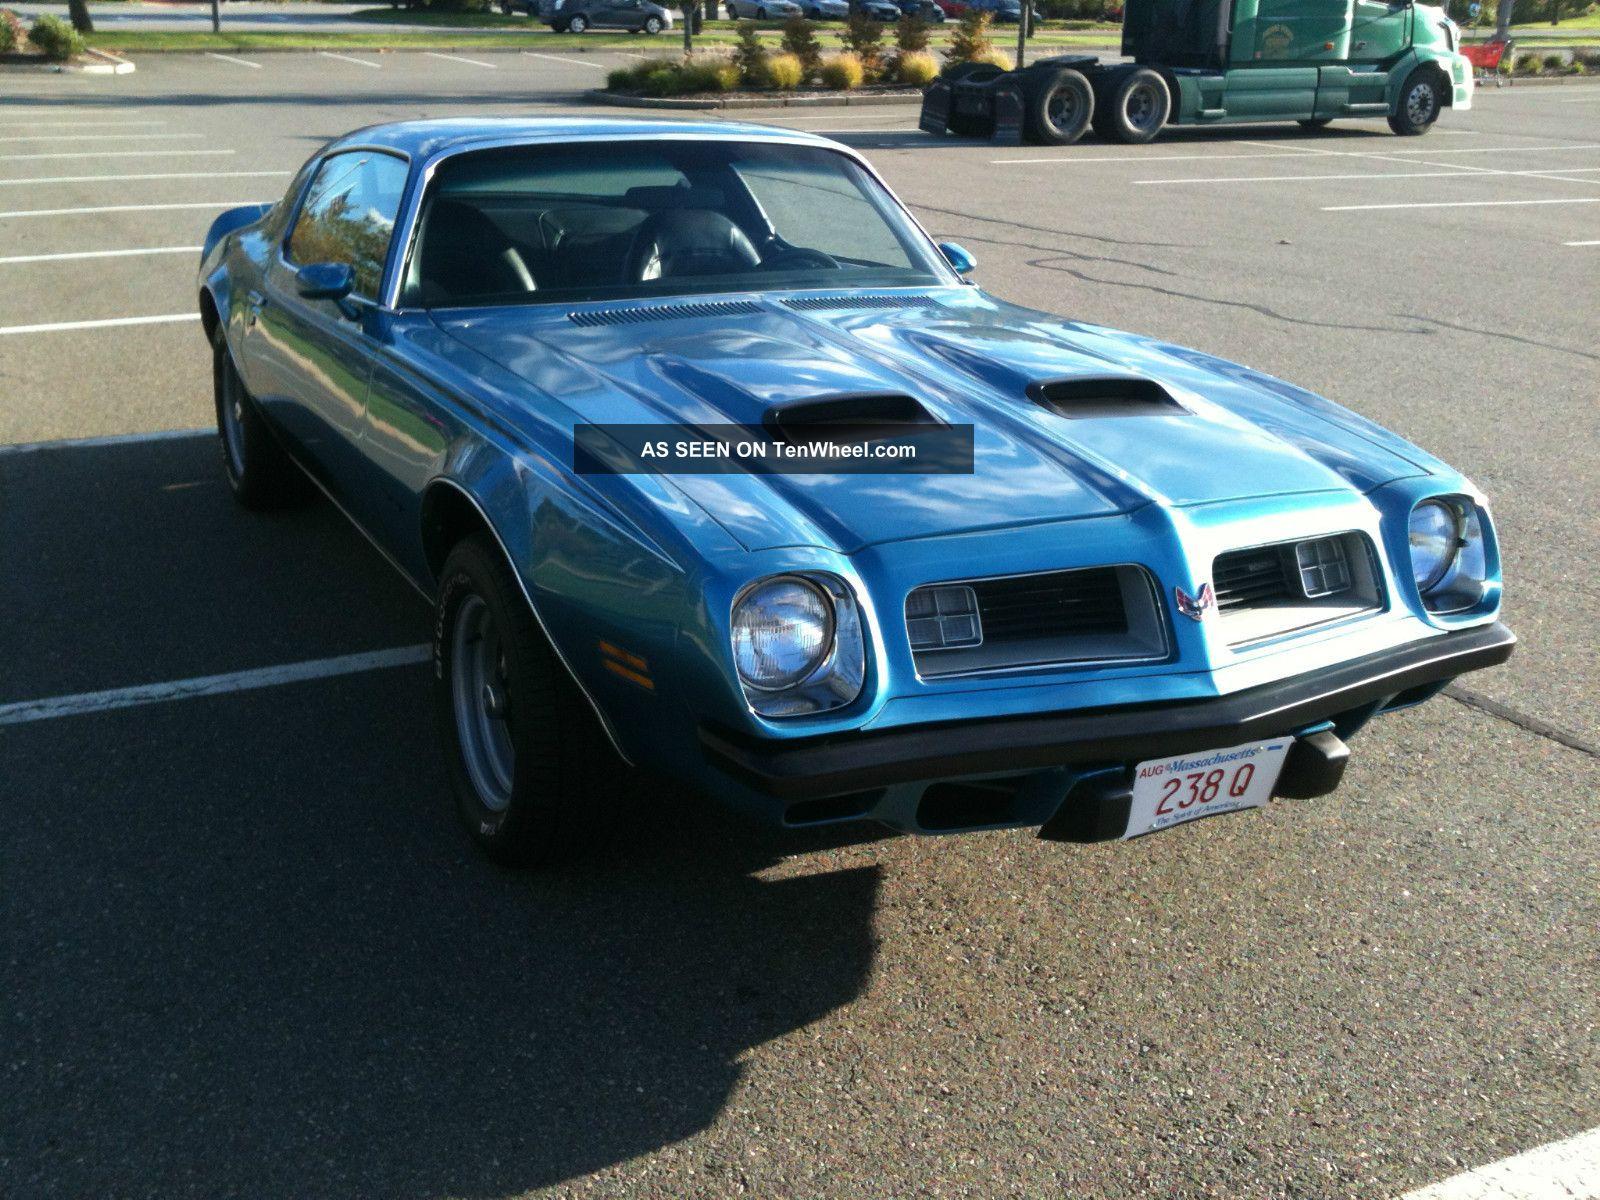 1975 Pontiac Firebird Formula 350 Tribute 4 Speed Trans Am